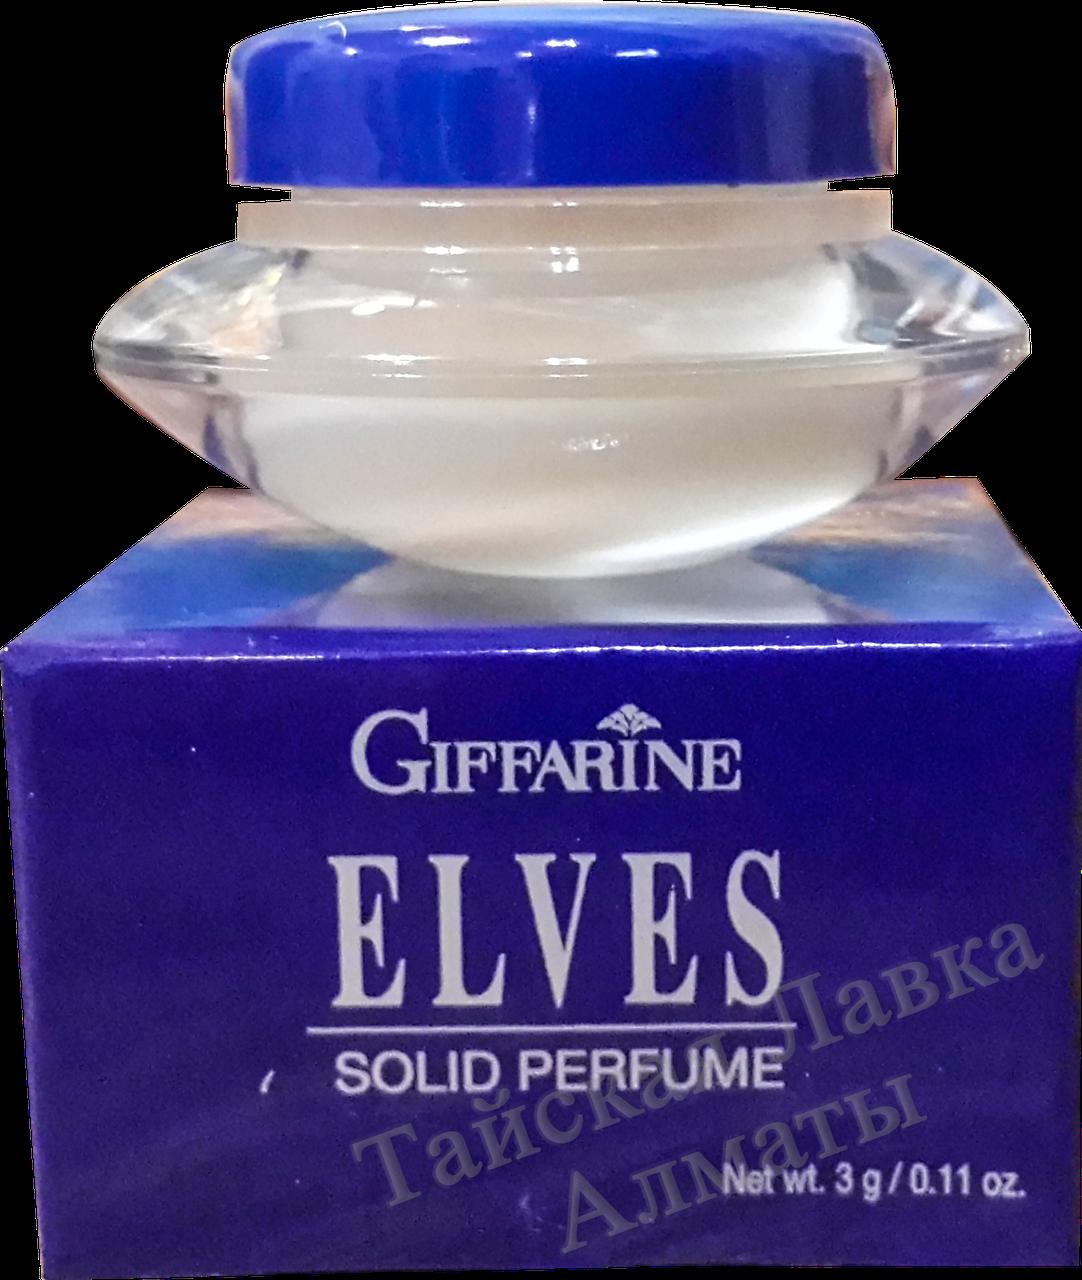 Духи с феромонами Elves (Giffarine)